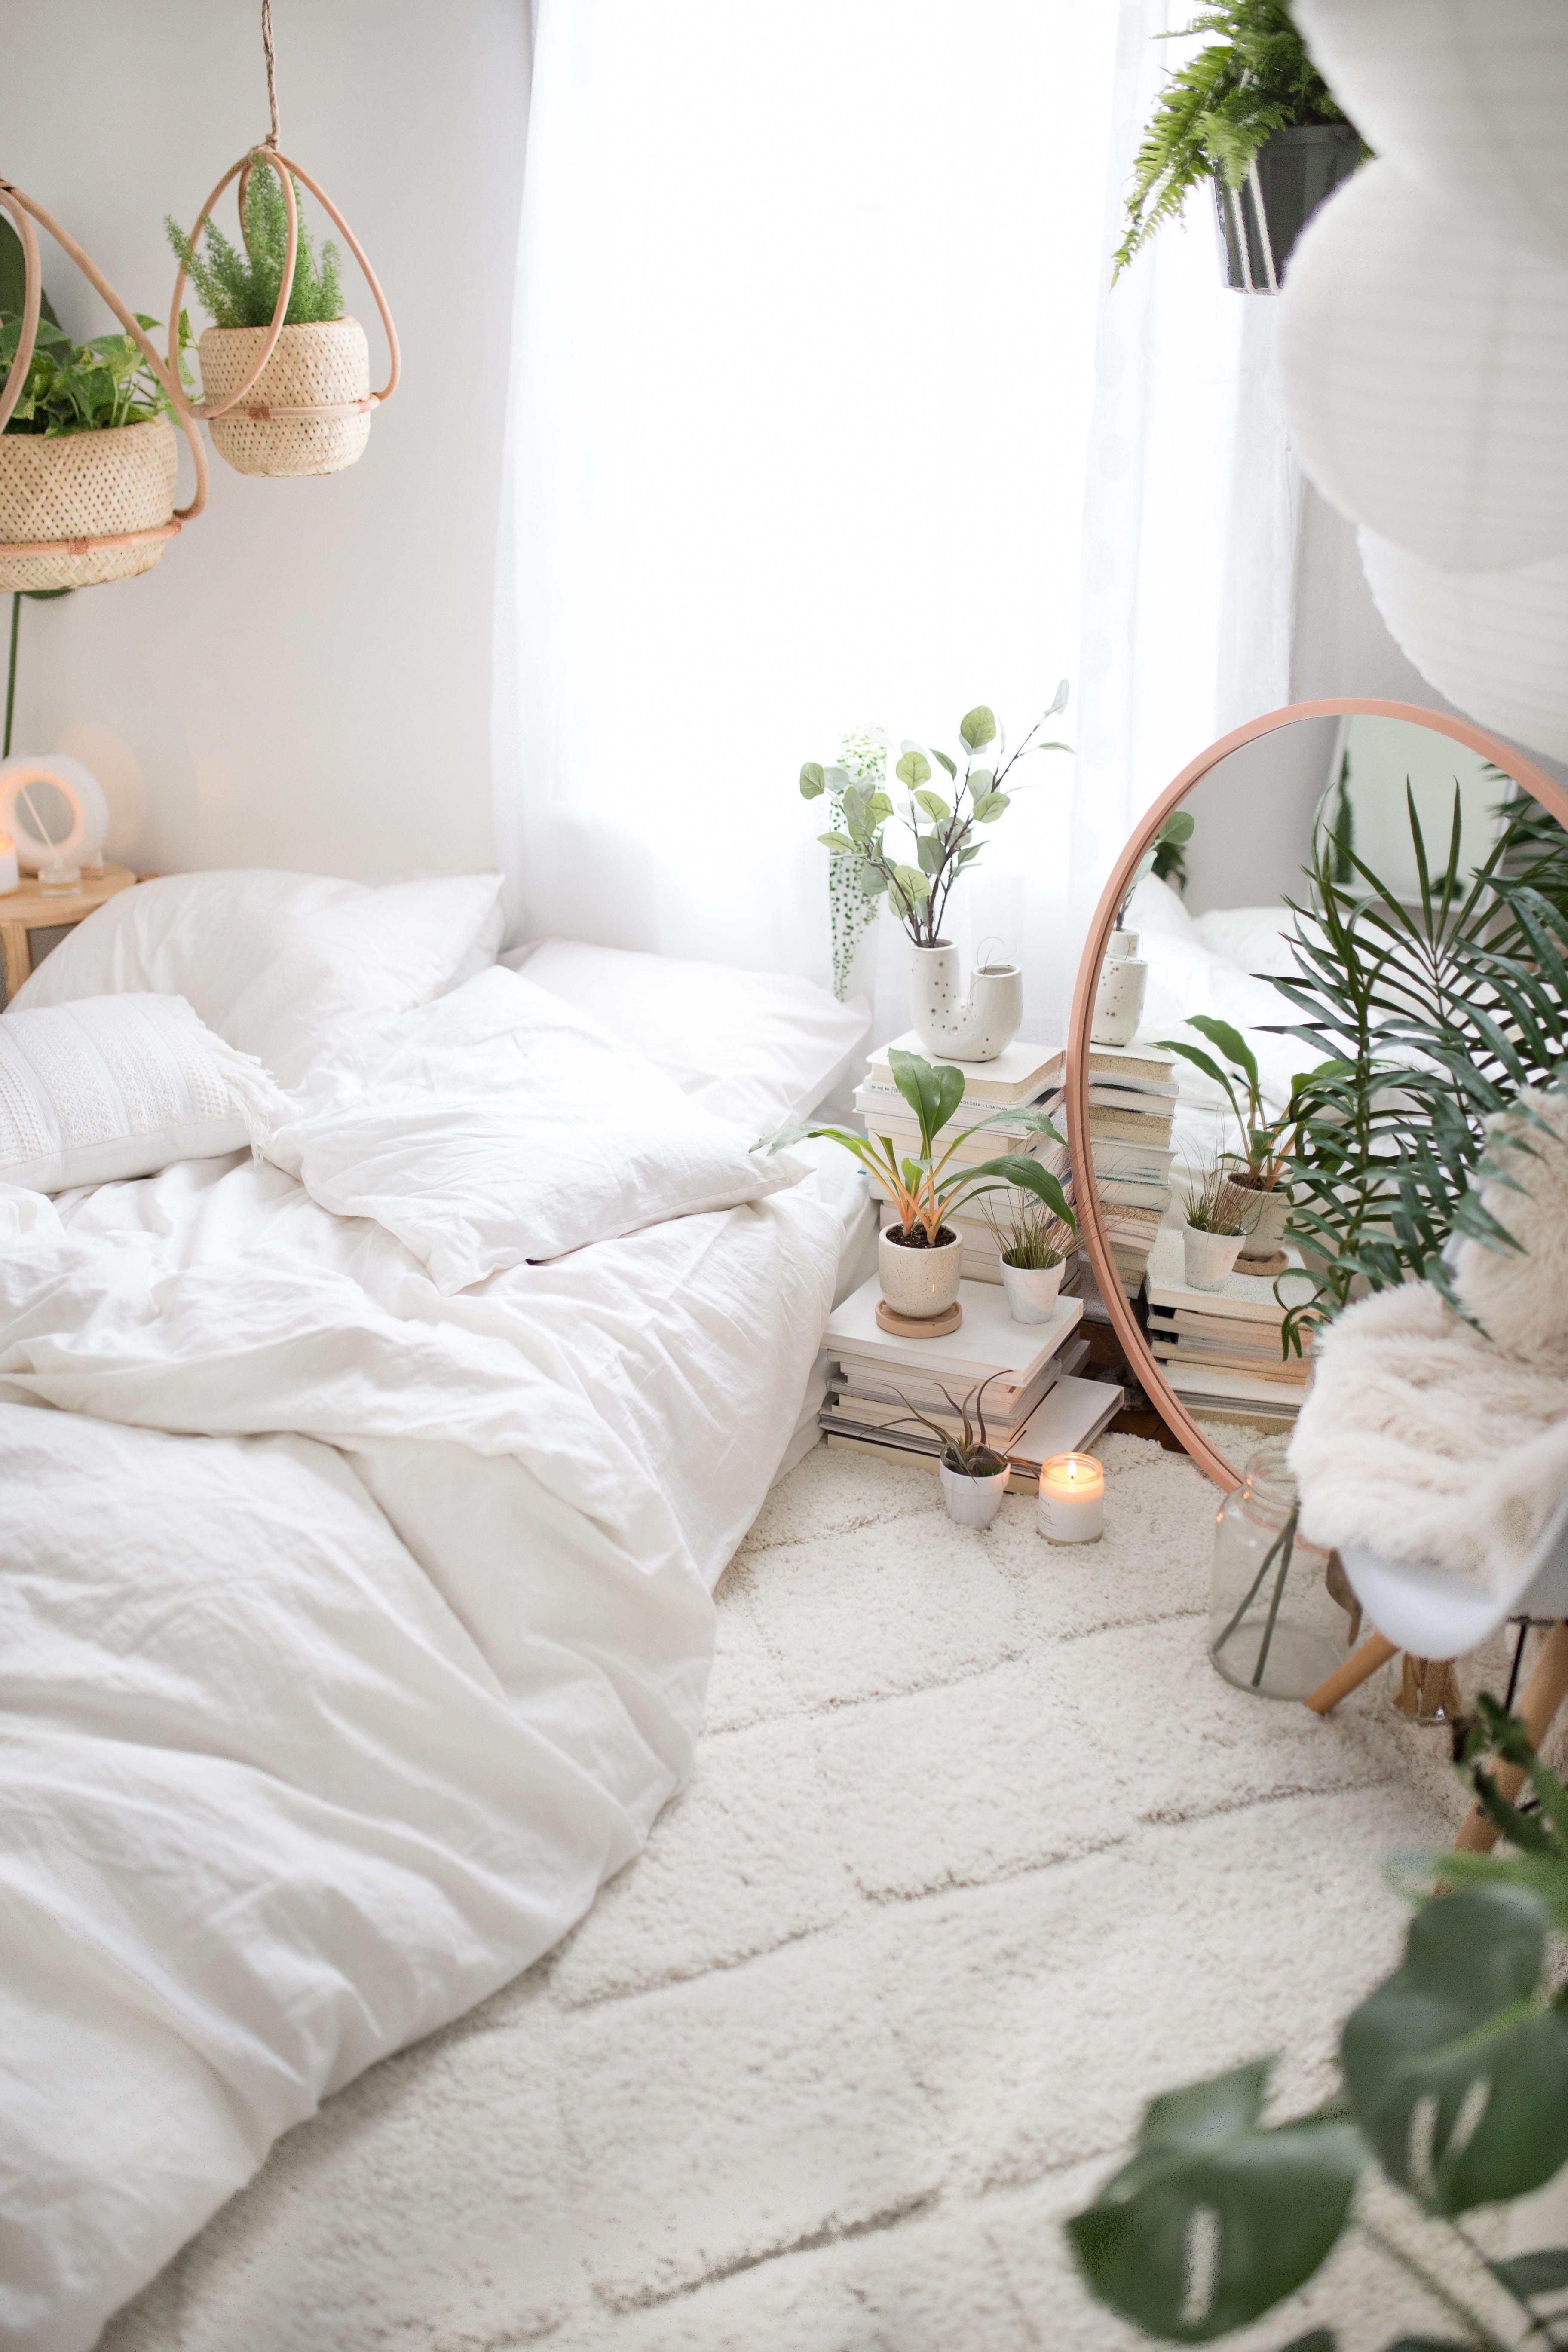 White Bedroom Design By Poli Twins Caitpoli Delaneypoli Of